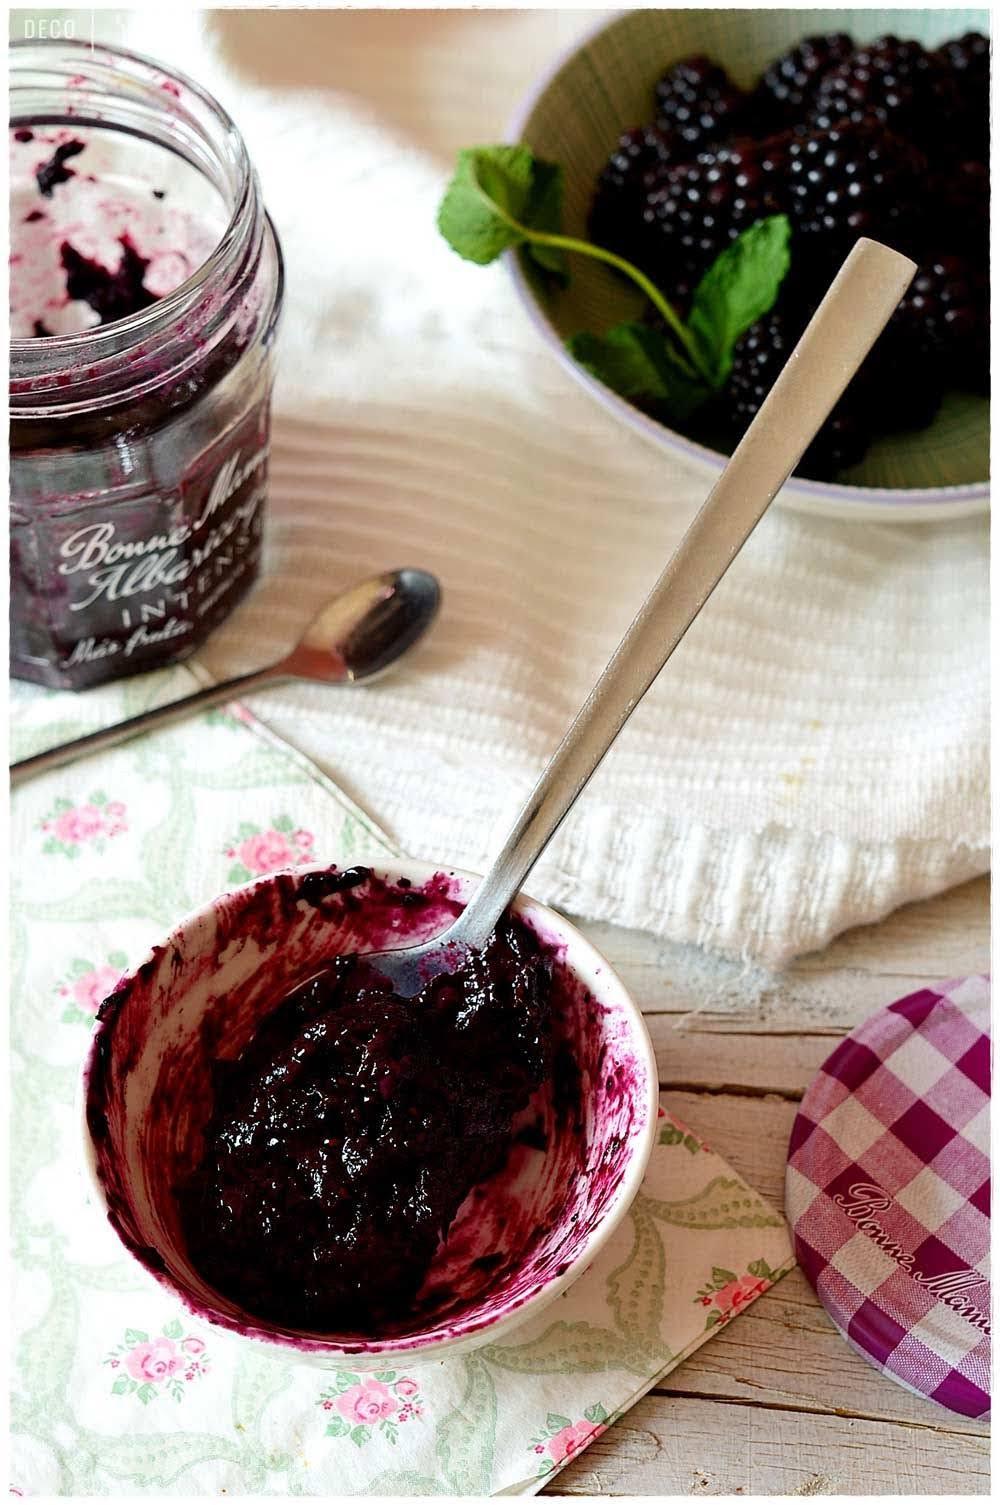 como hacer mermelada como hacer mermeladas hacer mermeladas mermelada sin azúcar thermomix